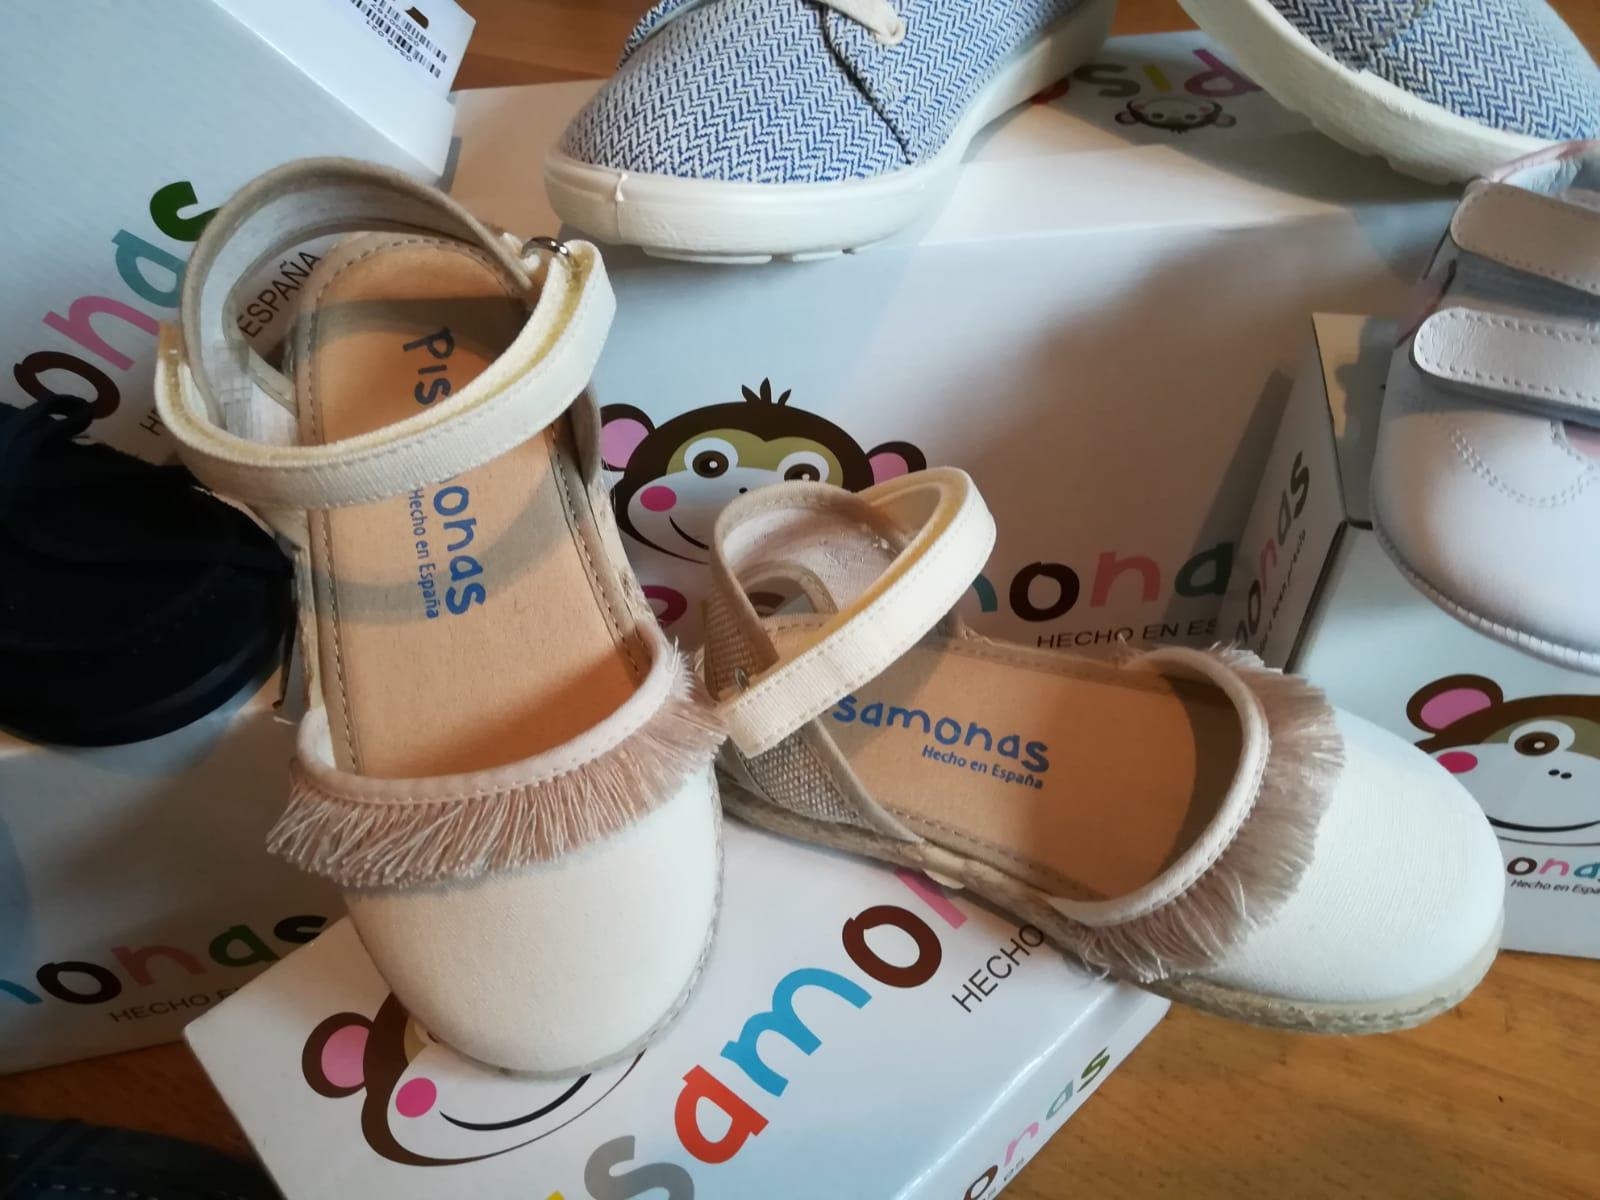 calzado infantil4 - Novedades en calzado infantil Pisamonas primavera-verano 2018